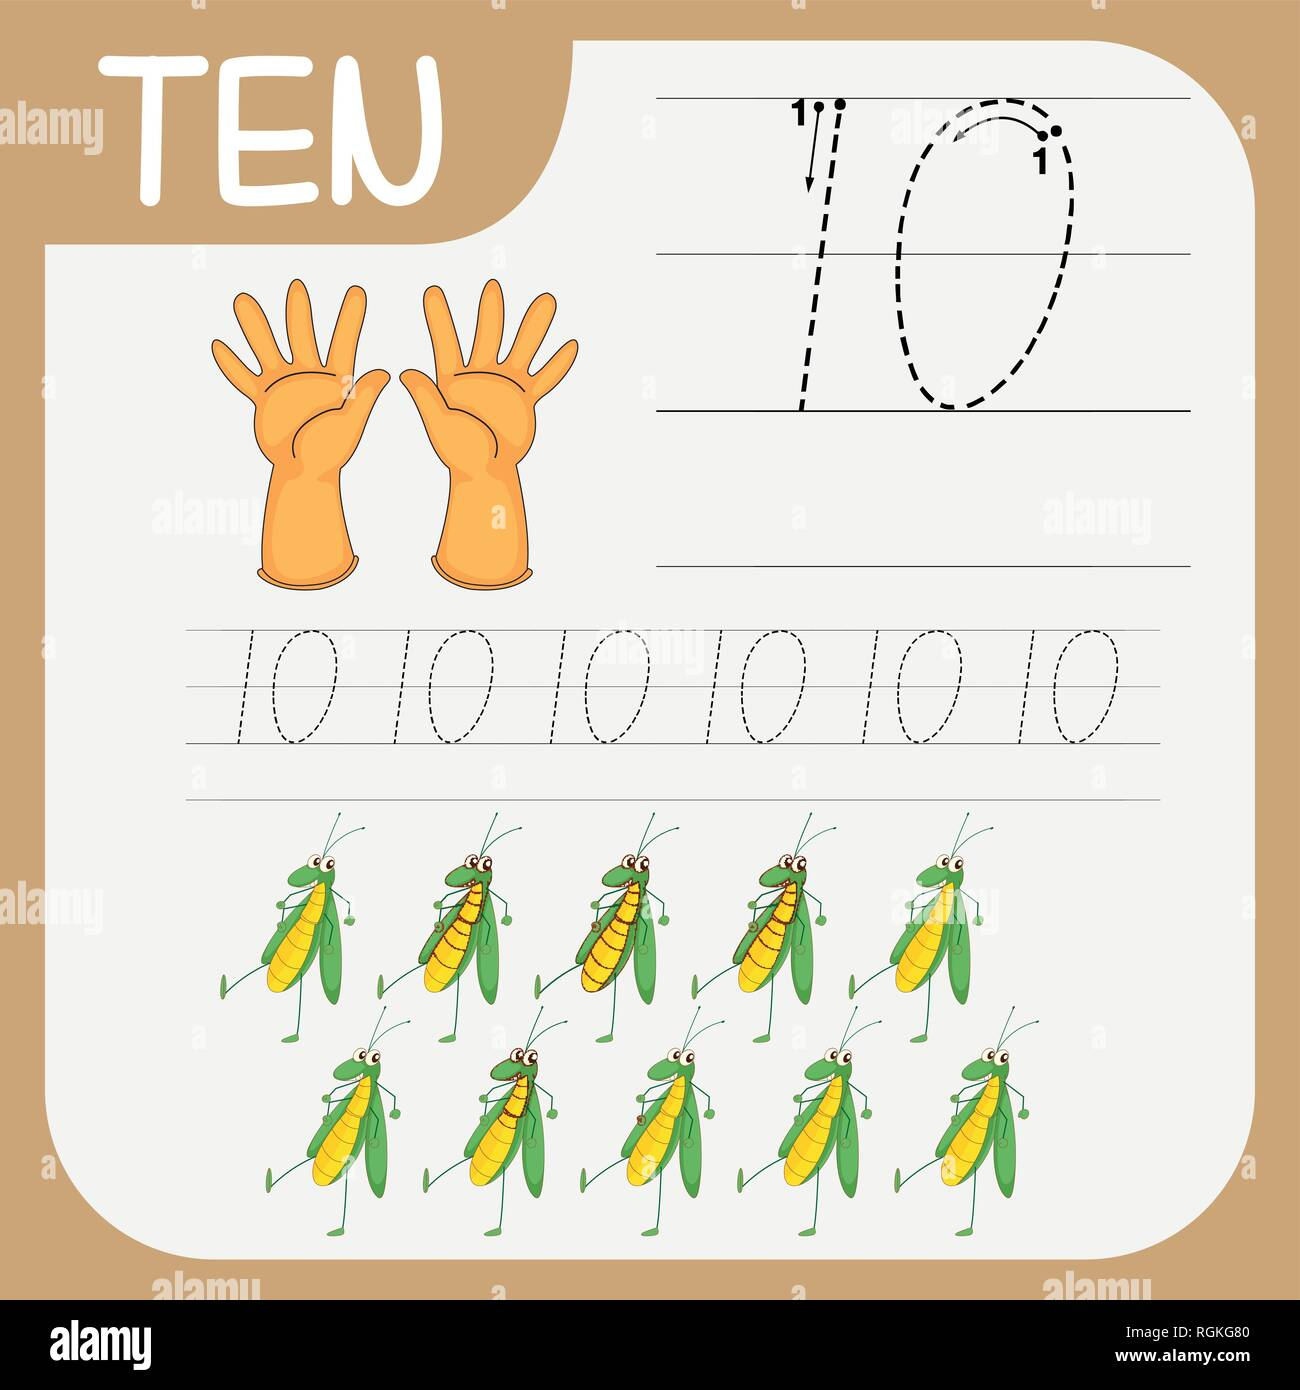 Number Ten Tracing Worksheets Illustration Stock Vector